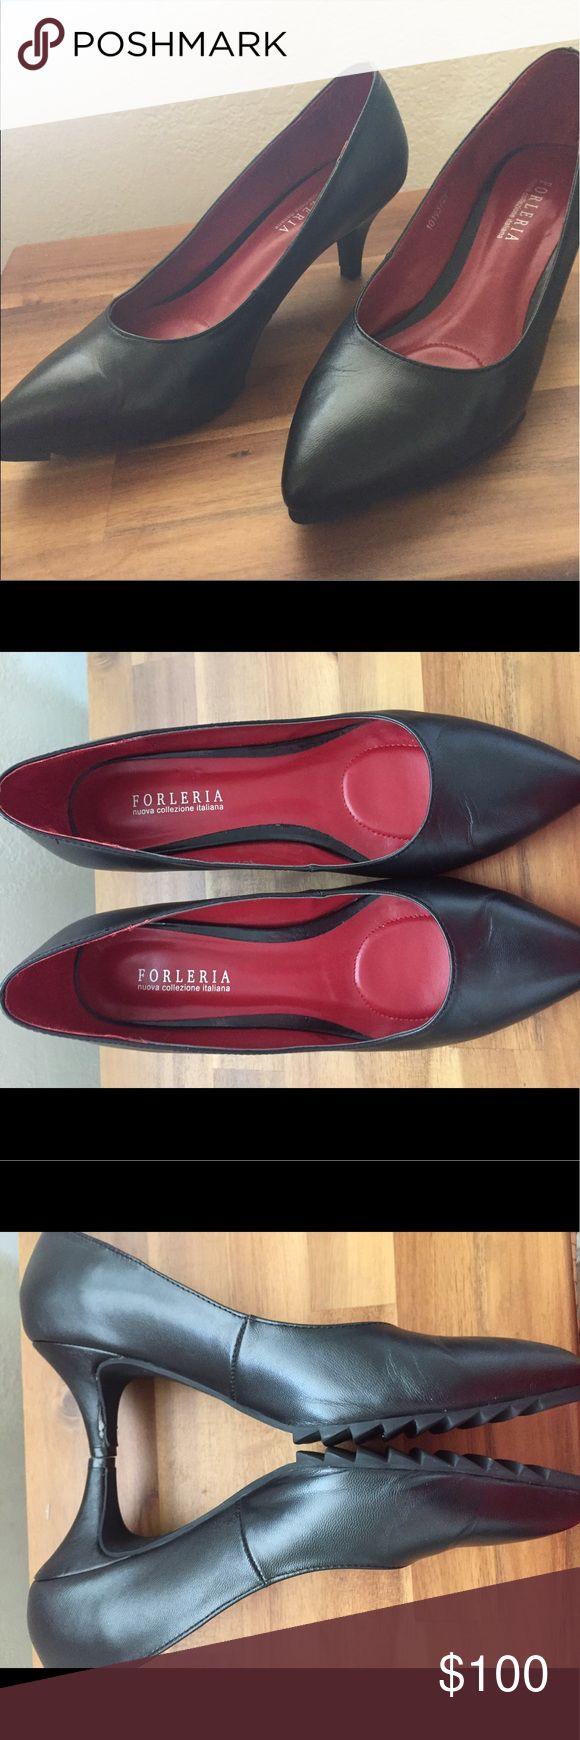 Forleria Italian black pumps with red soles sz 37 Forleria new black pumps with red sole, size 37 made in Italy. forleria Shoes Heels